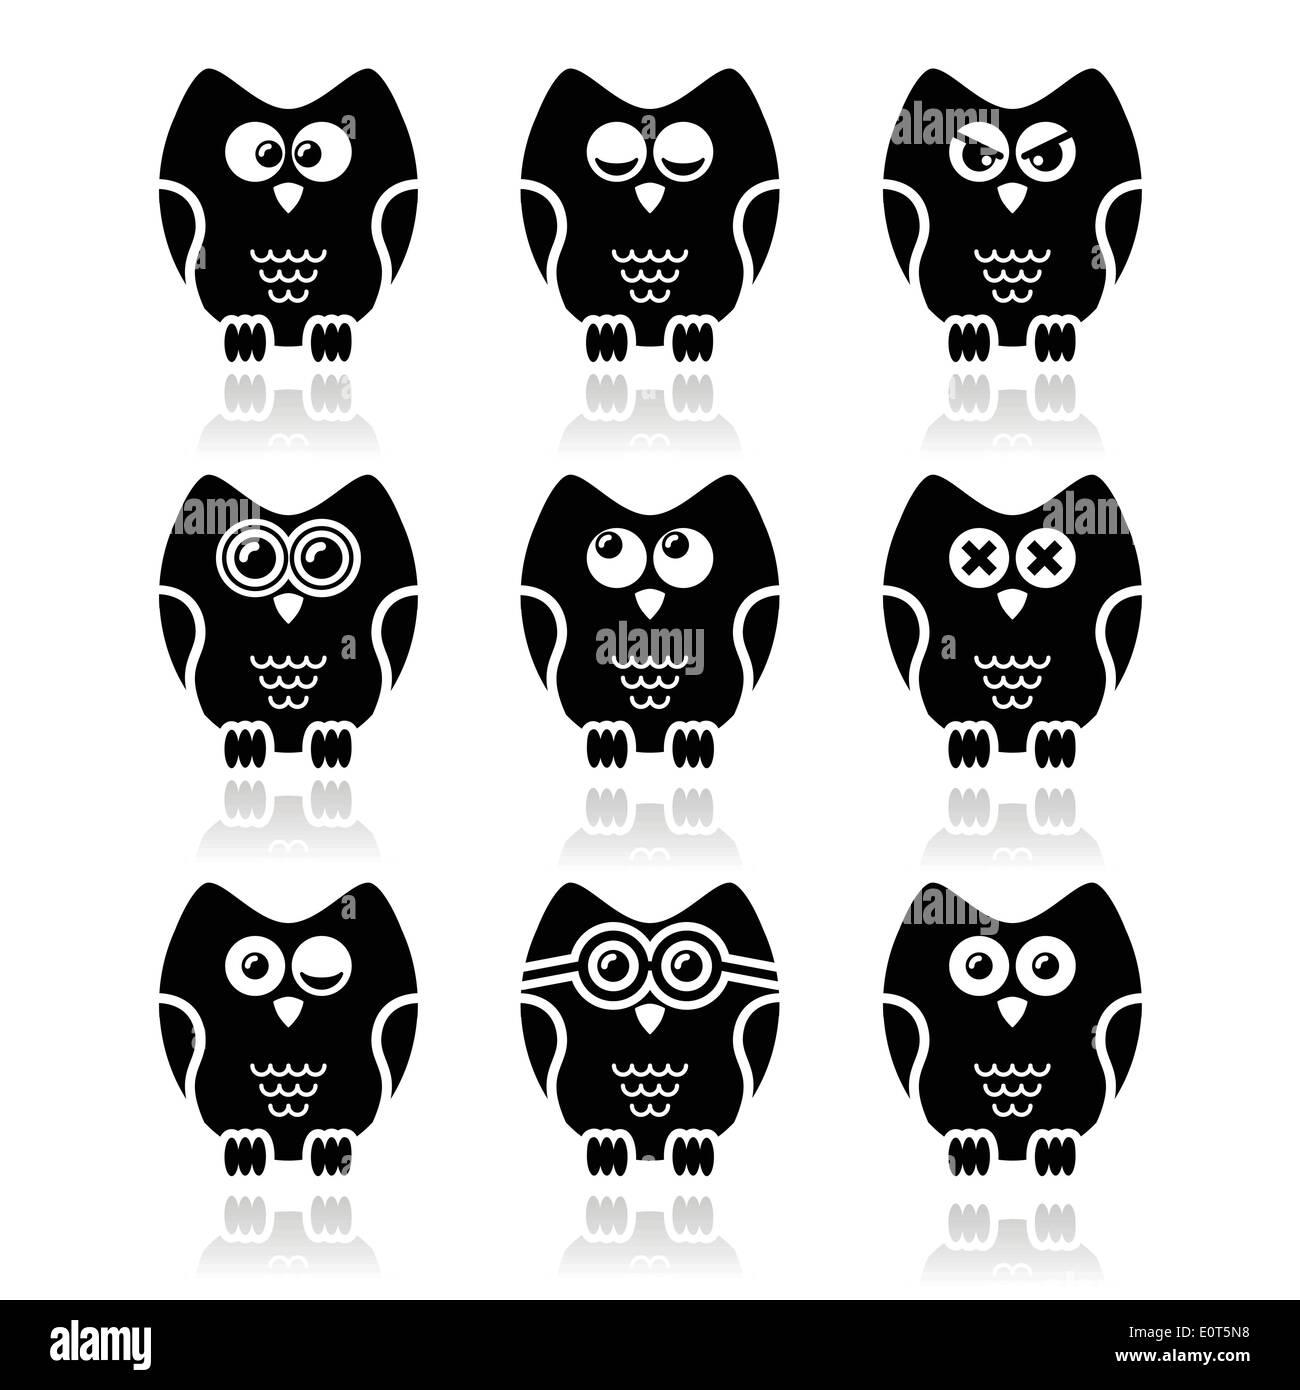 Owl cartoon character vector icons set Stock Vector